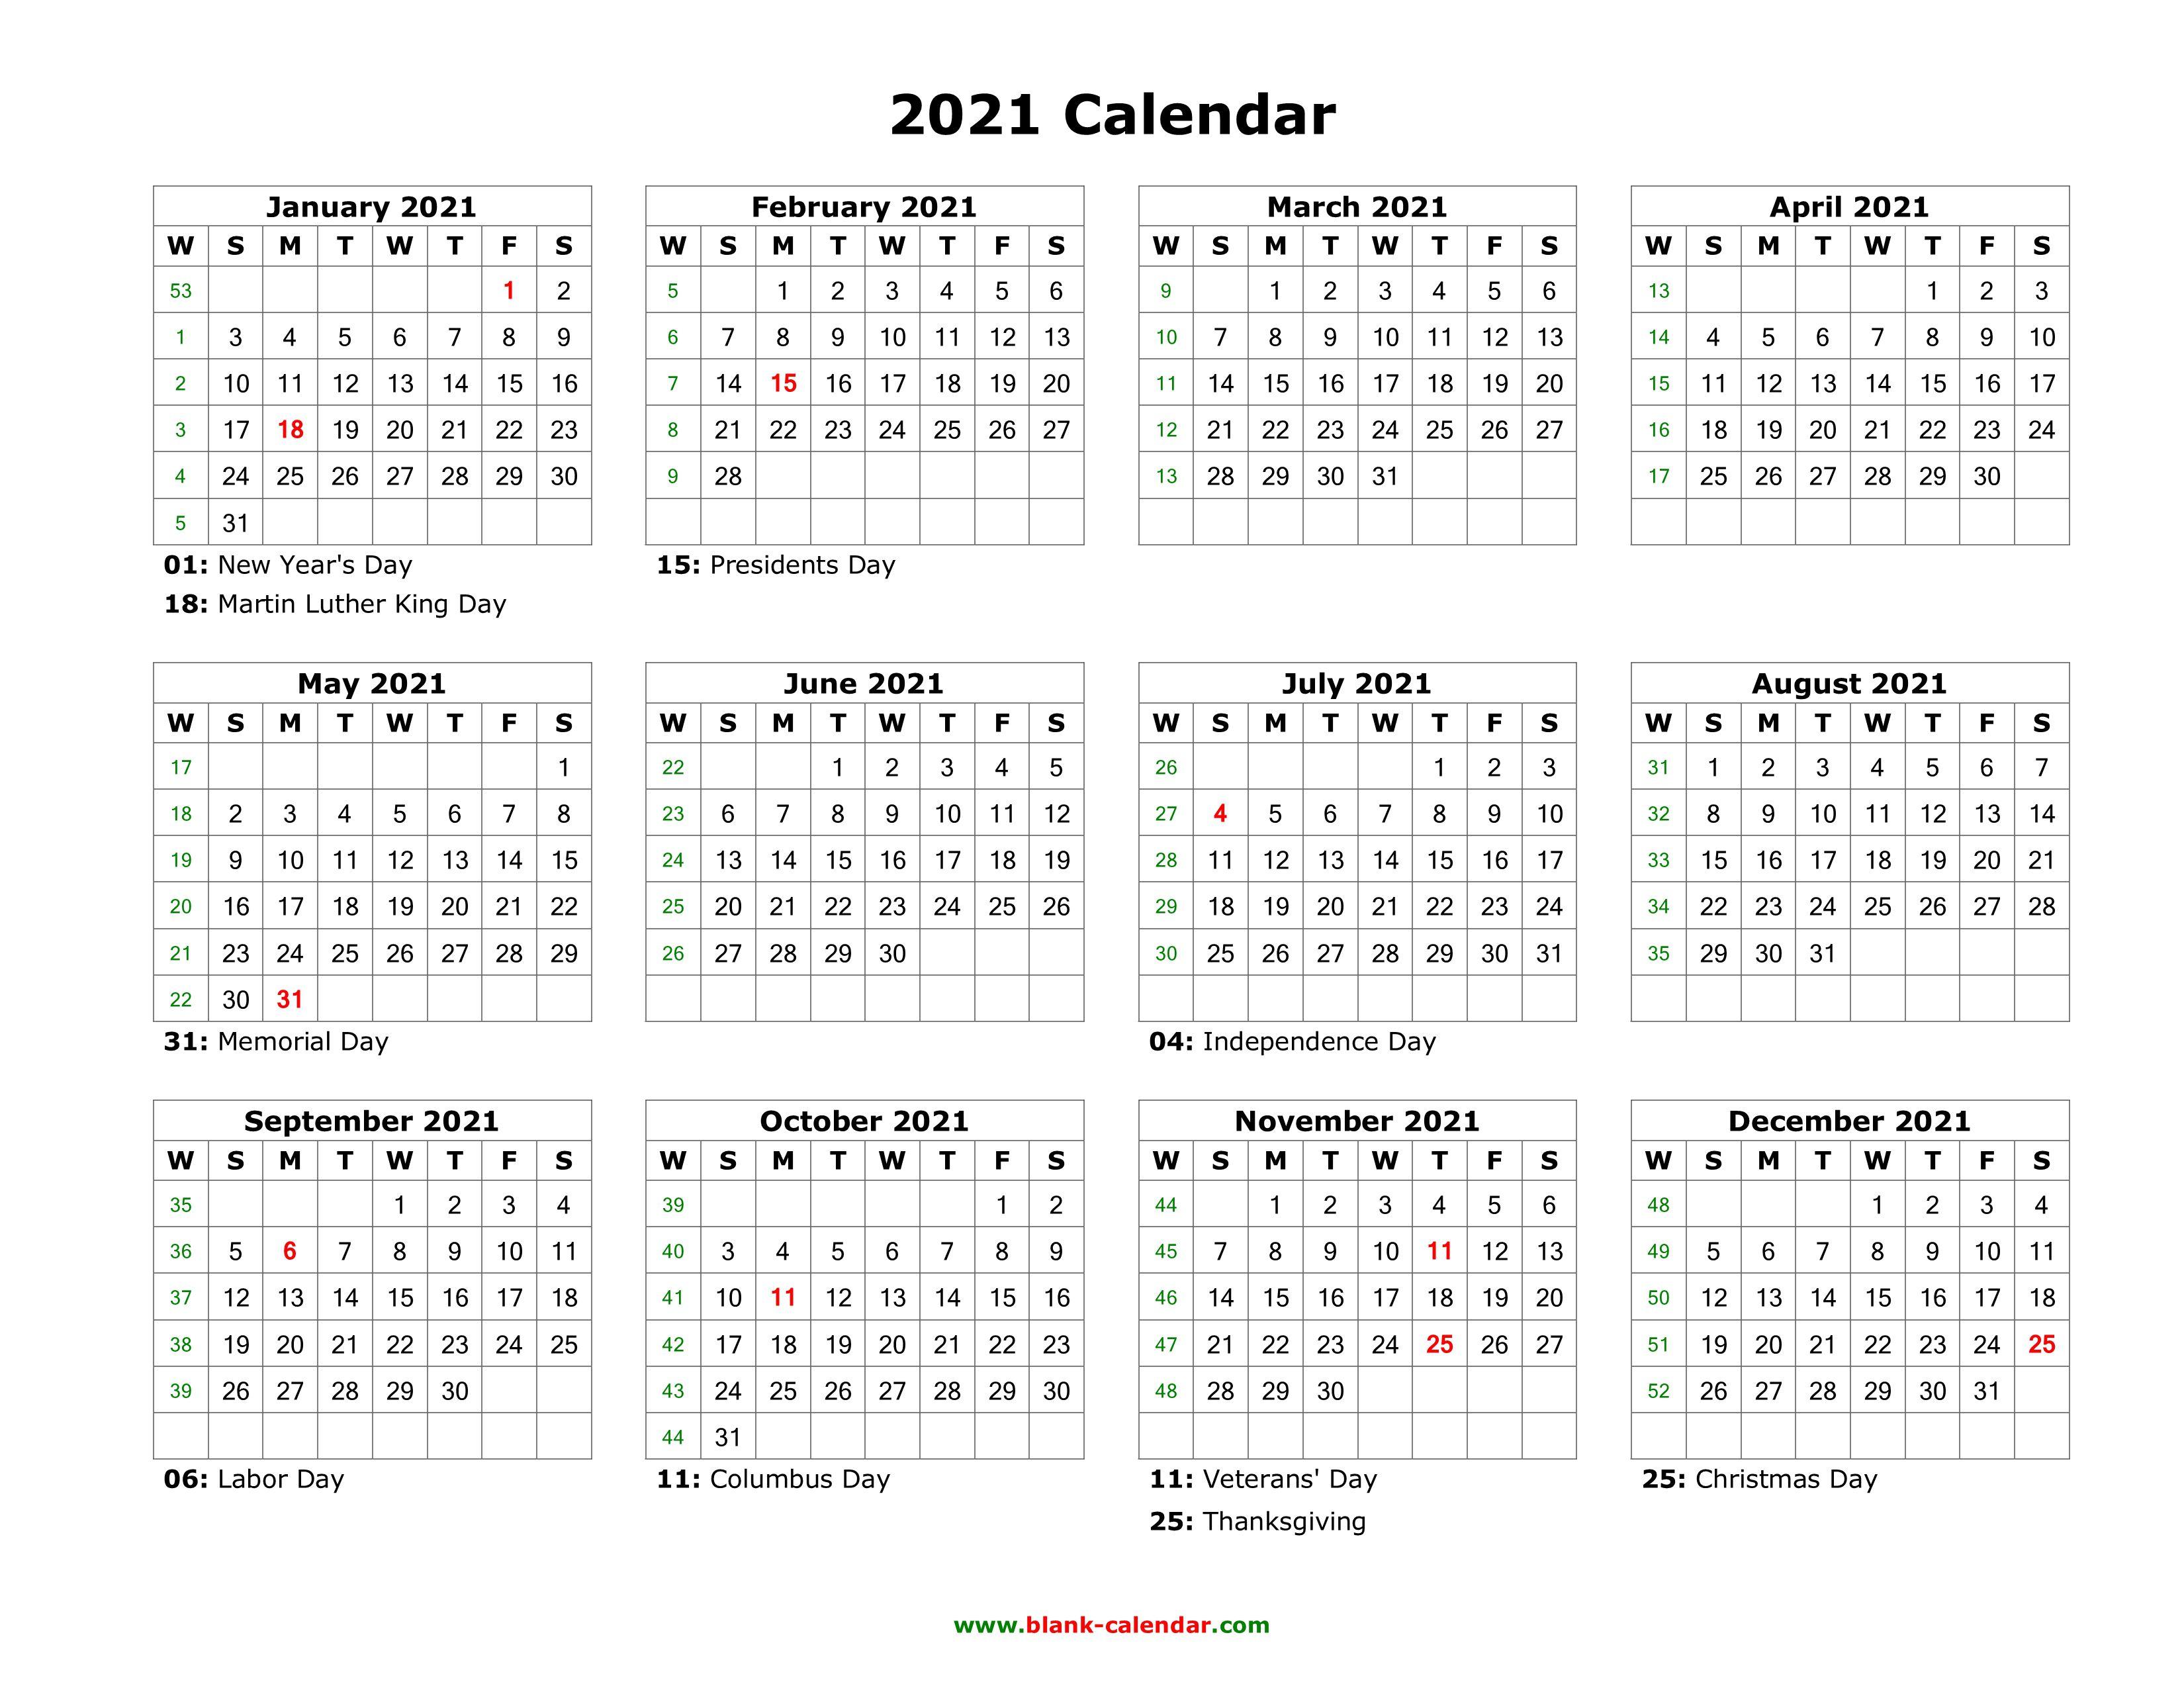 009 Wonderful Editable Calendar Google Doc 2021 Idea Full